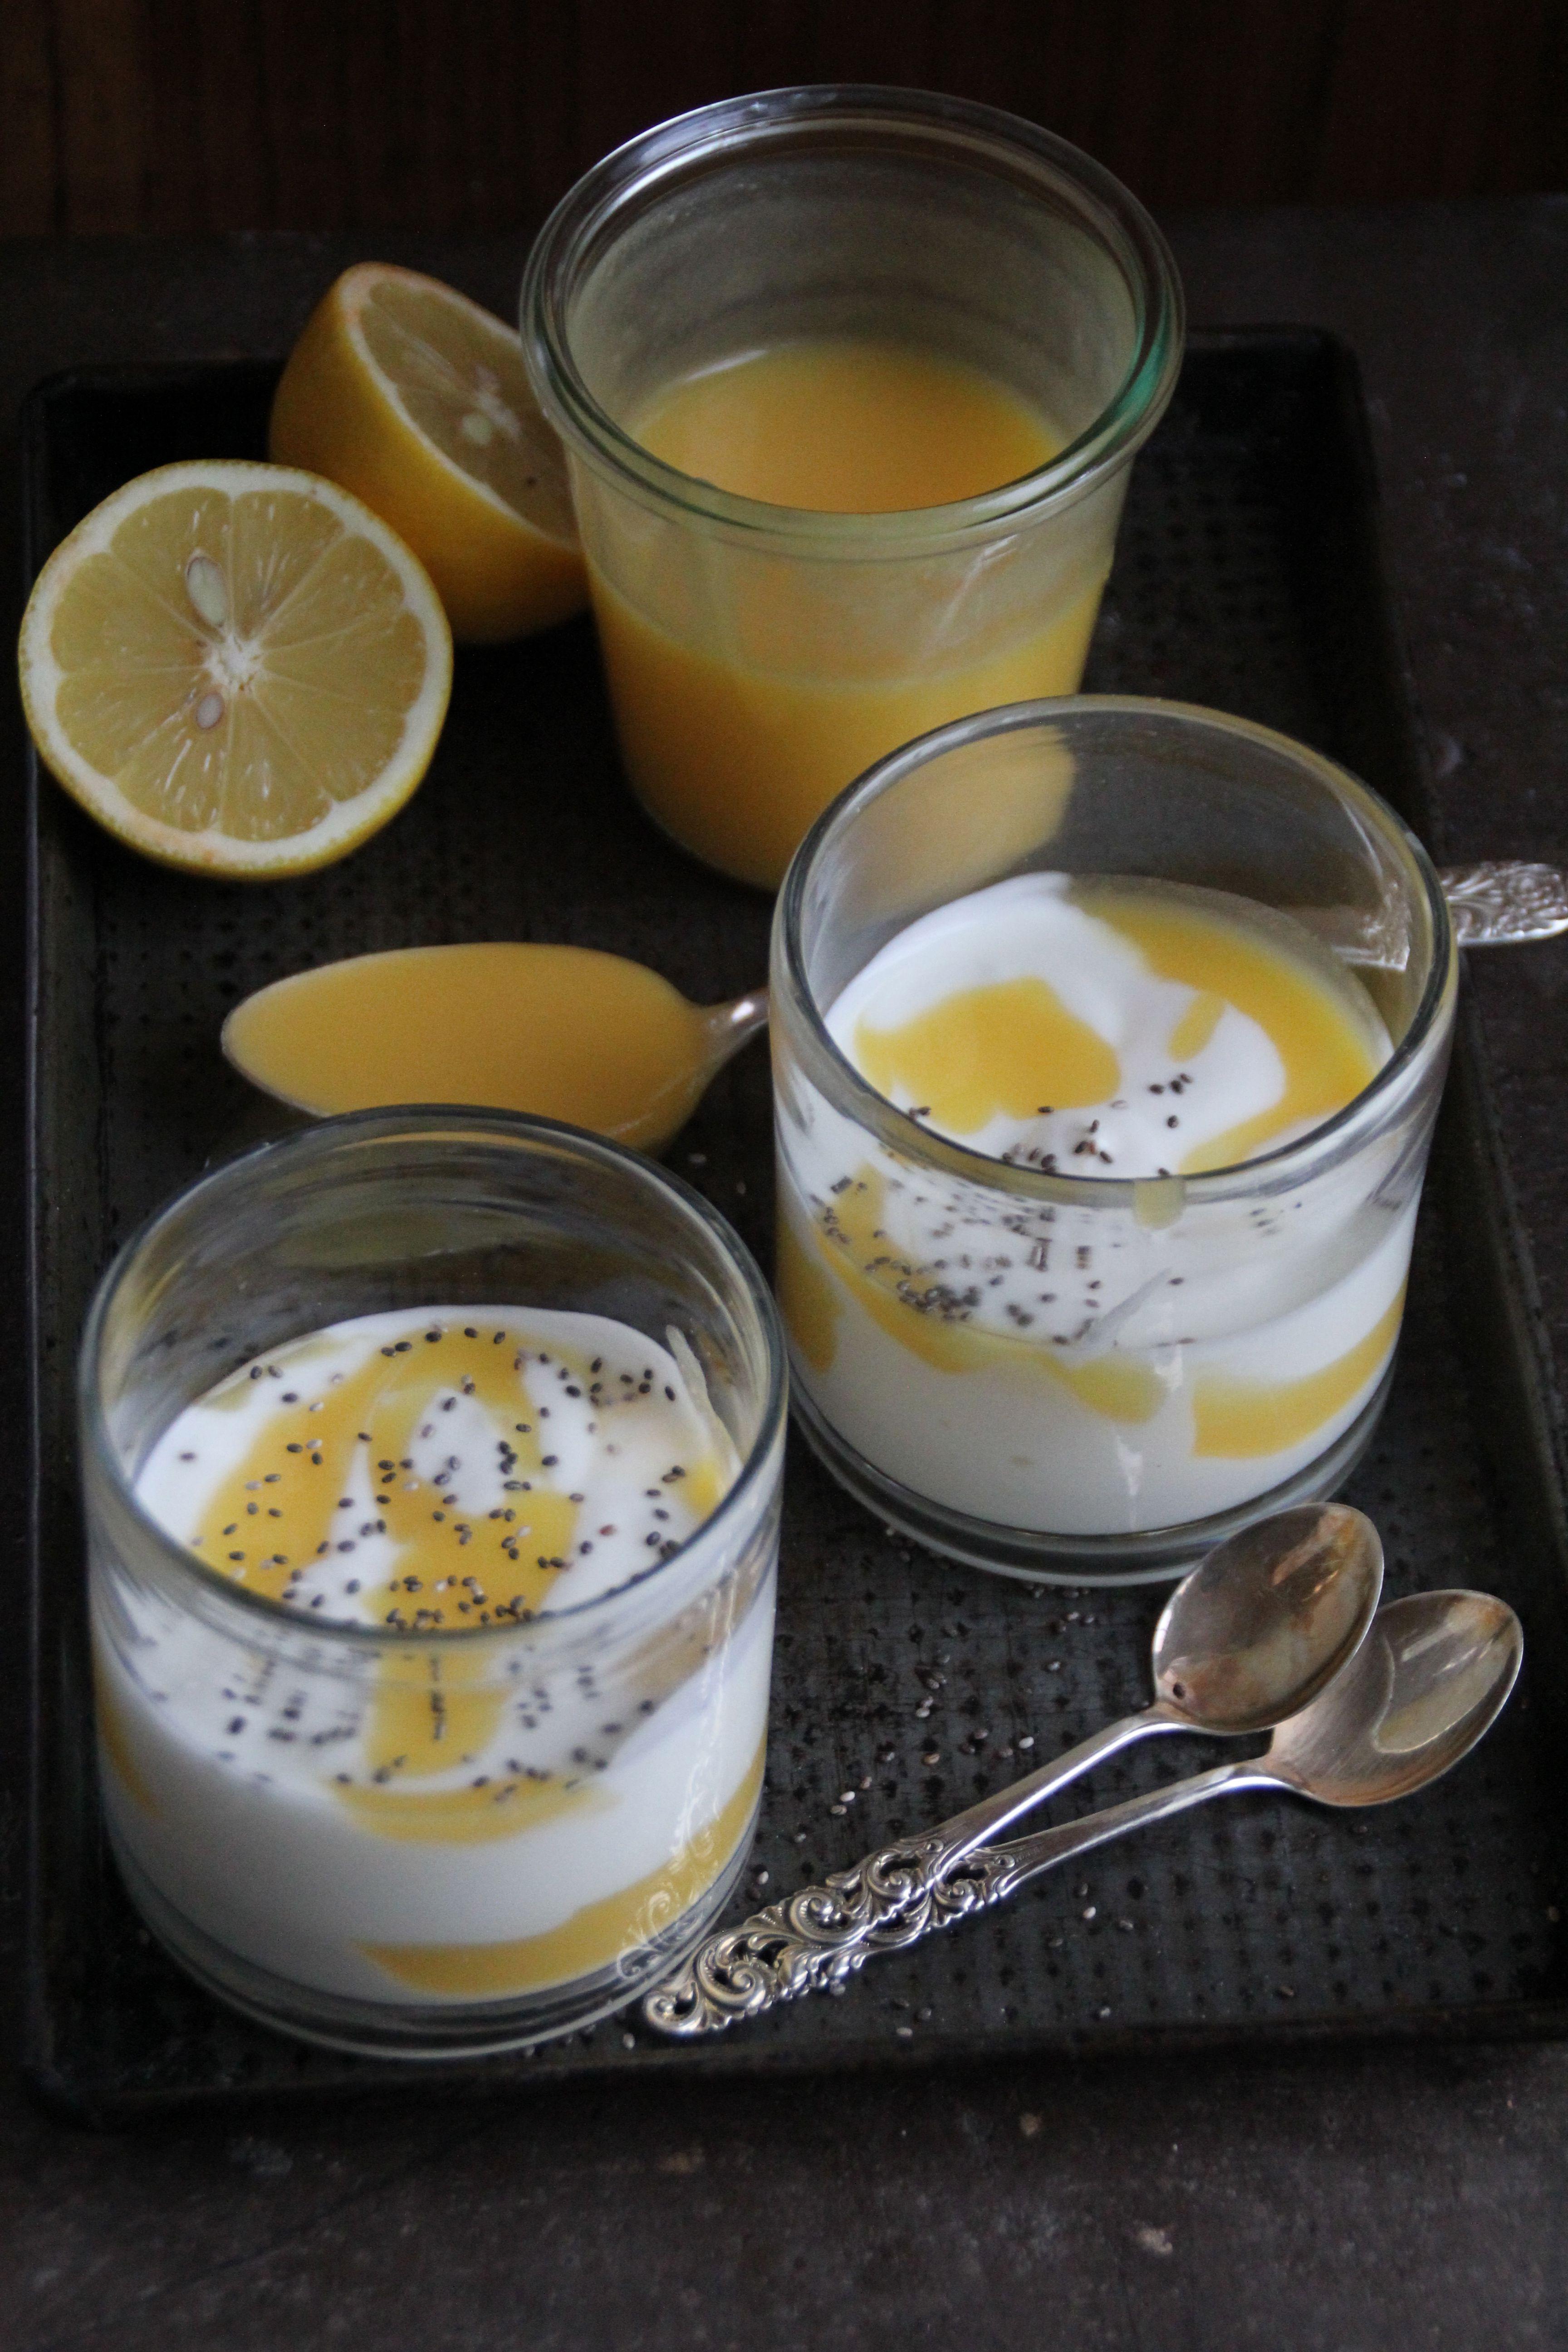 yoghurt & lemon curd